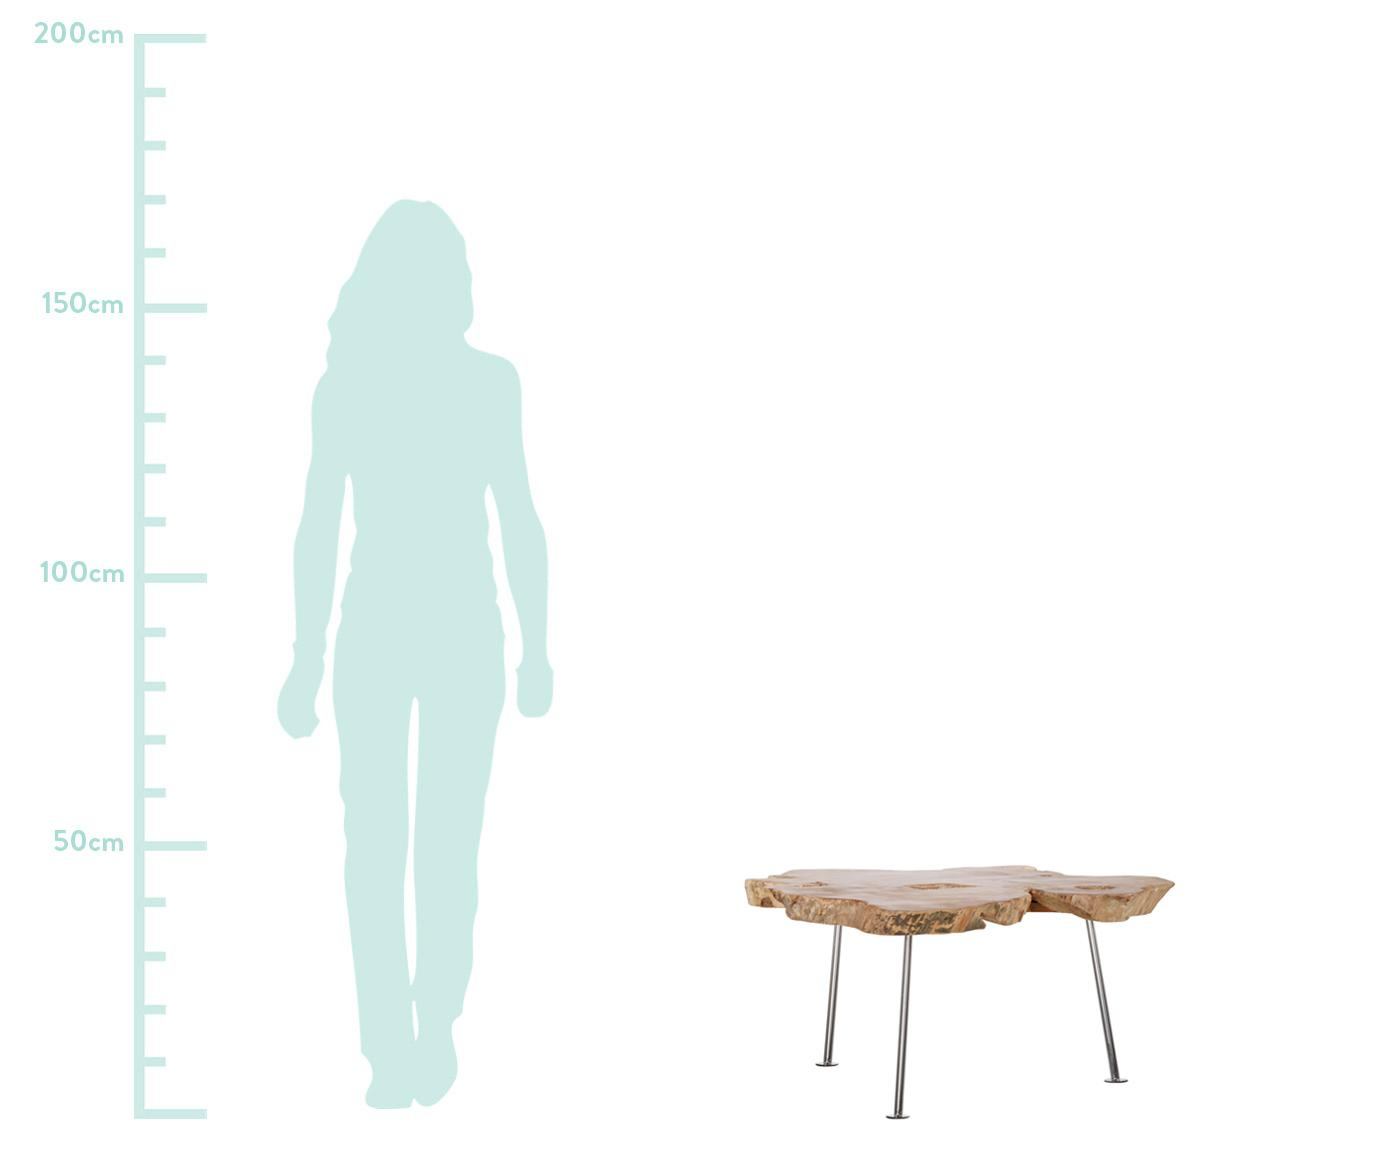 Couchtisch Diki, Tischplatte: Recyceltes Teakholz, unbe, Beine: Edelstahl, Teakholz, Edelstahl, Ø 75 - 95 x H 39 cm